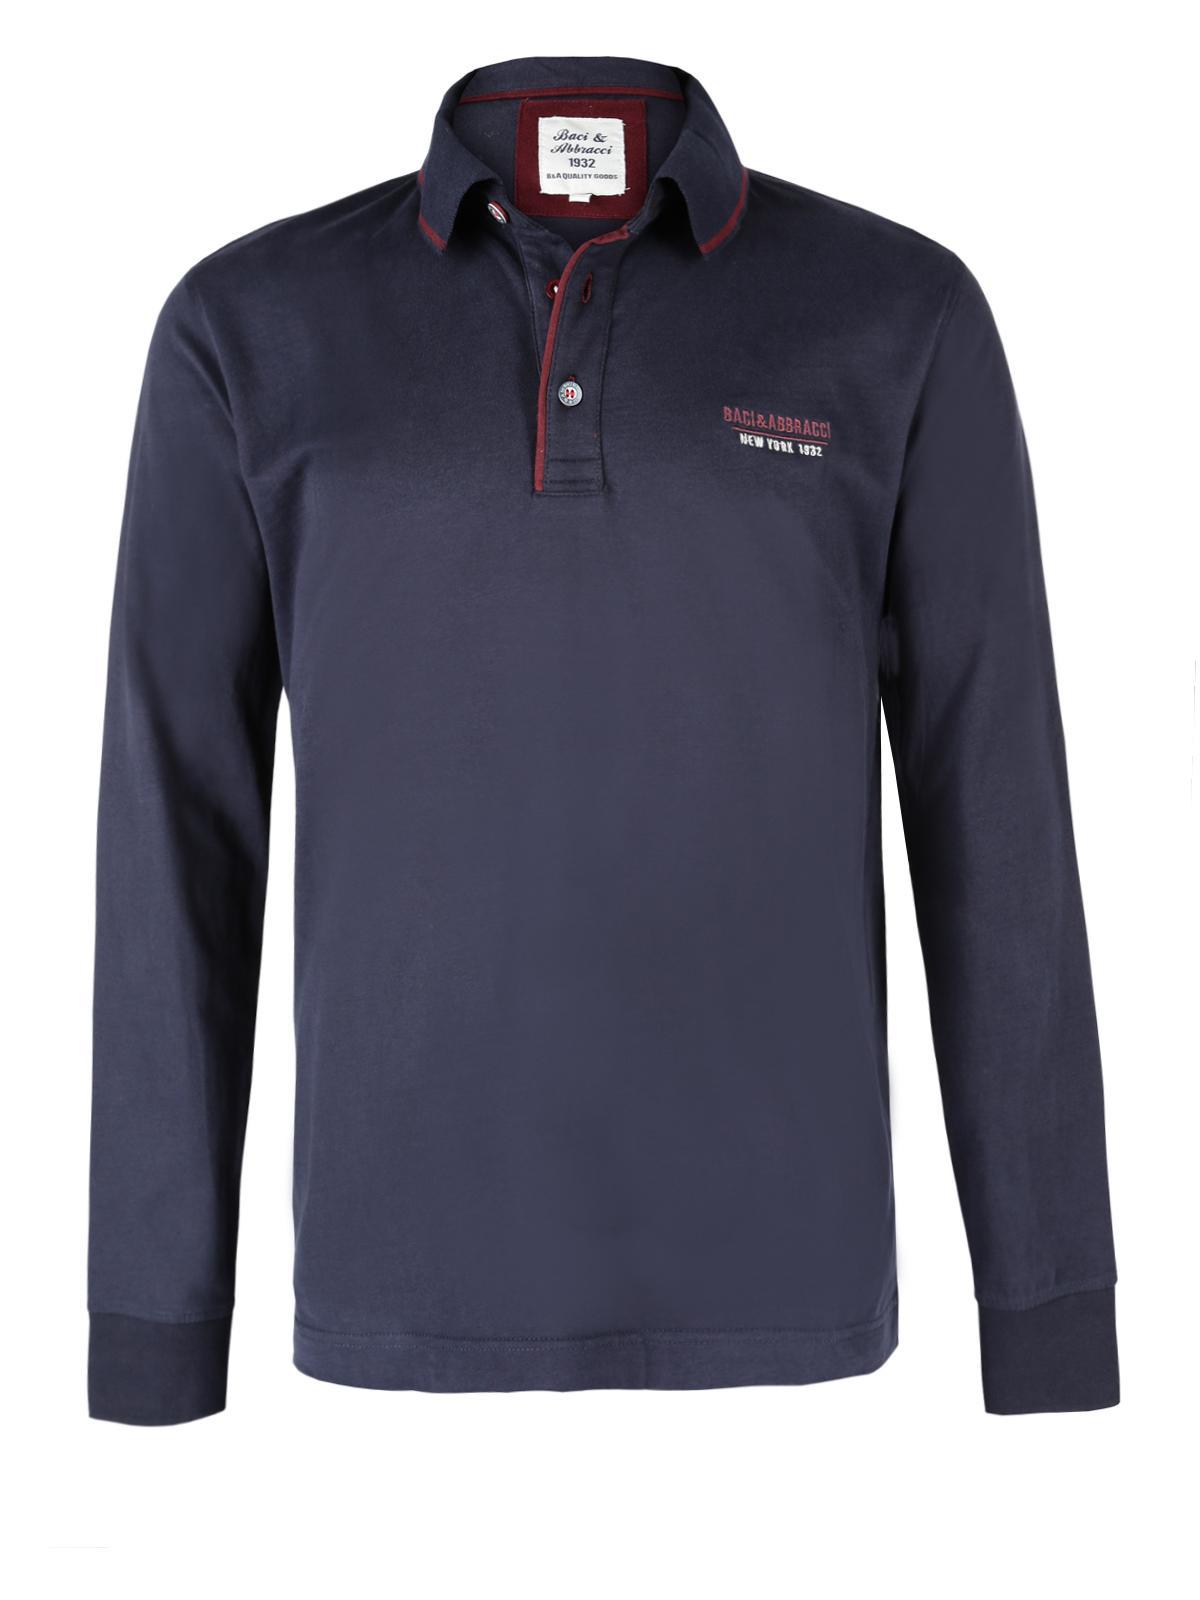 Baciamp; ShirtMecshopping Abbracci Cotton Men's Polo iuXPkZ